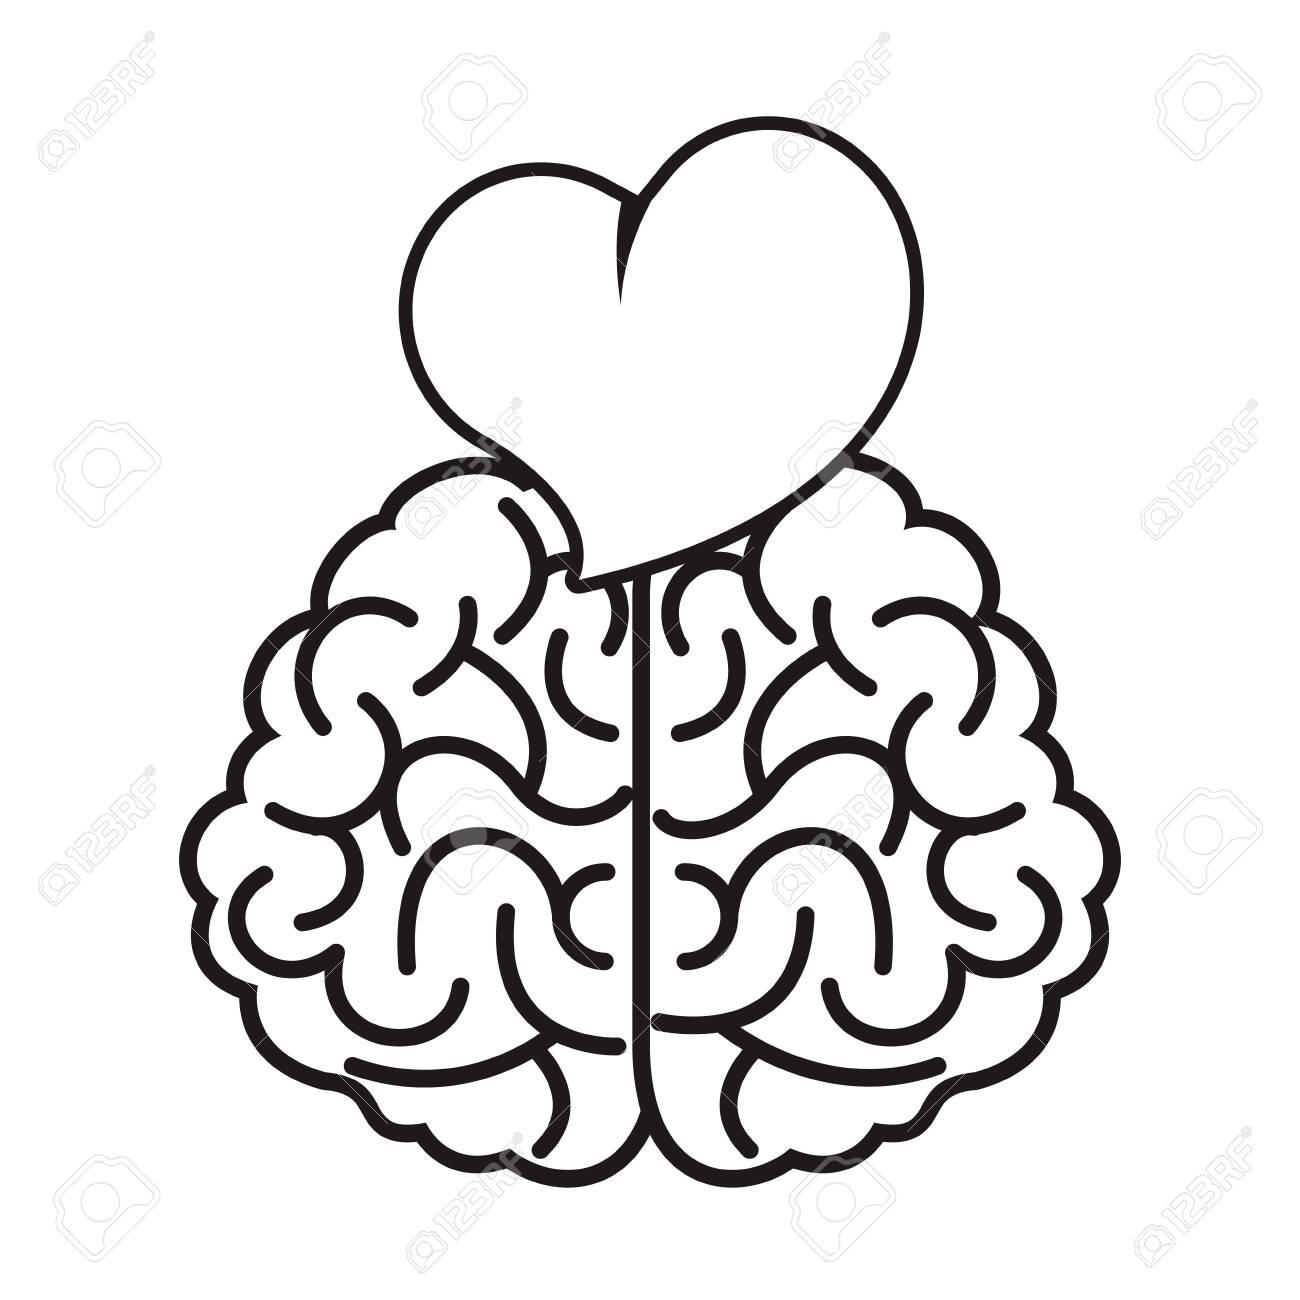 brain with heart love icon vector illustration design - 143031864